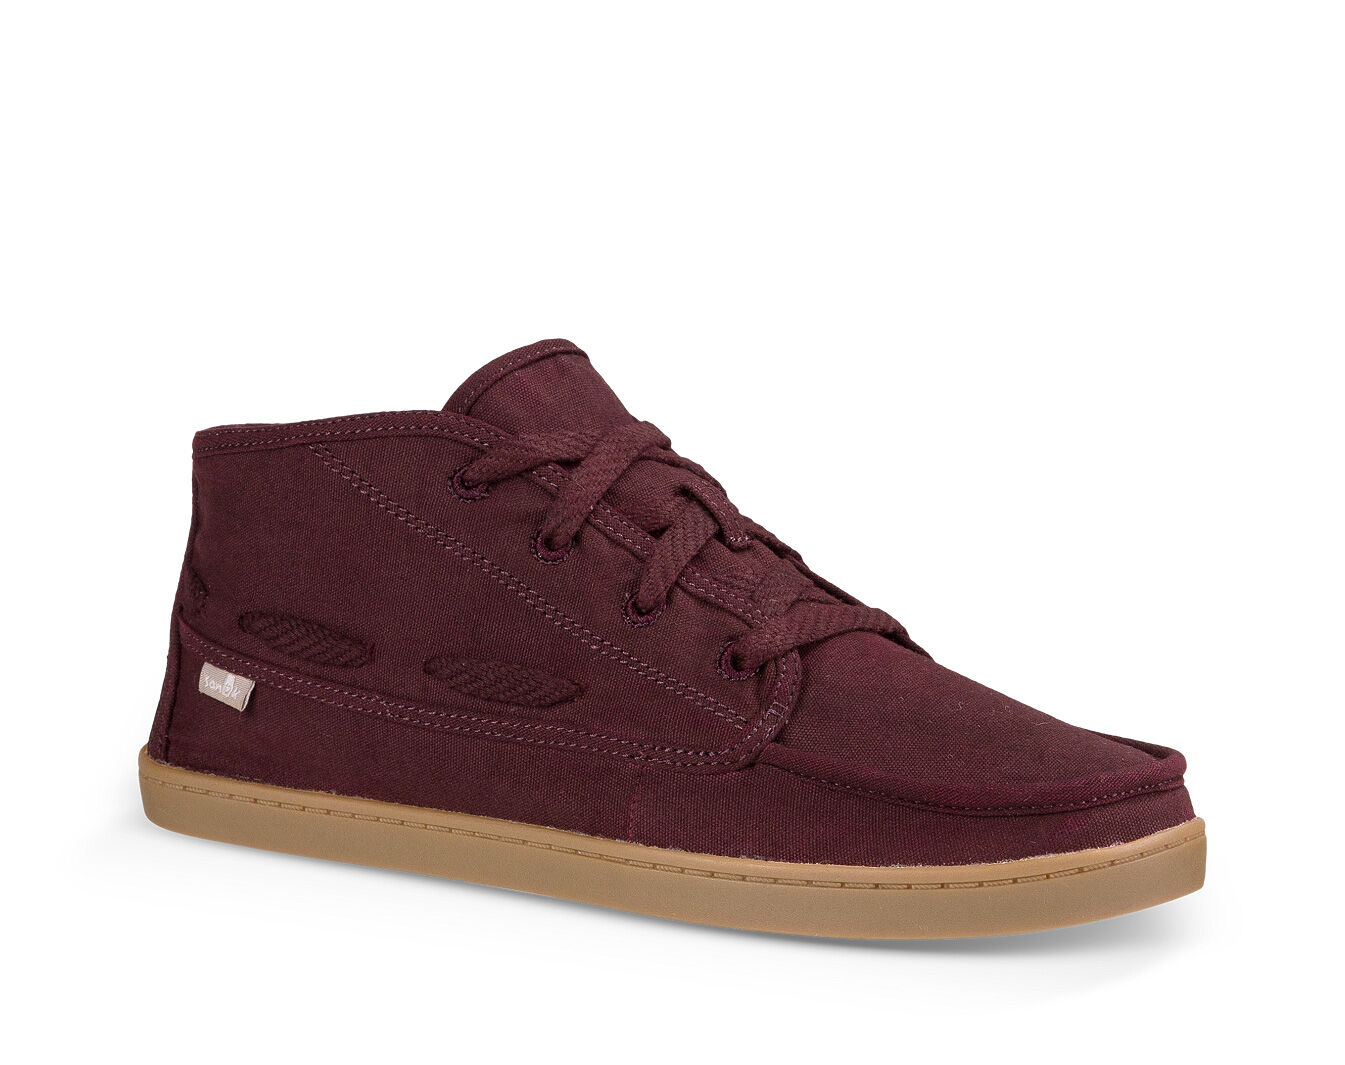 27b3e5581c24 womens shoes for sale   OFF47% Discounts